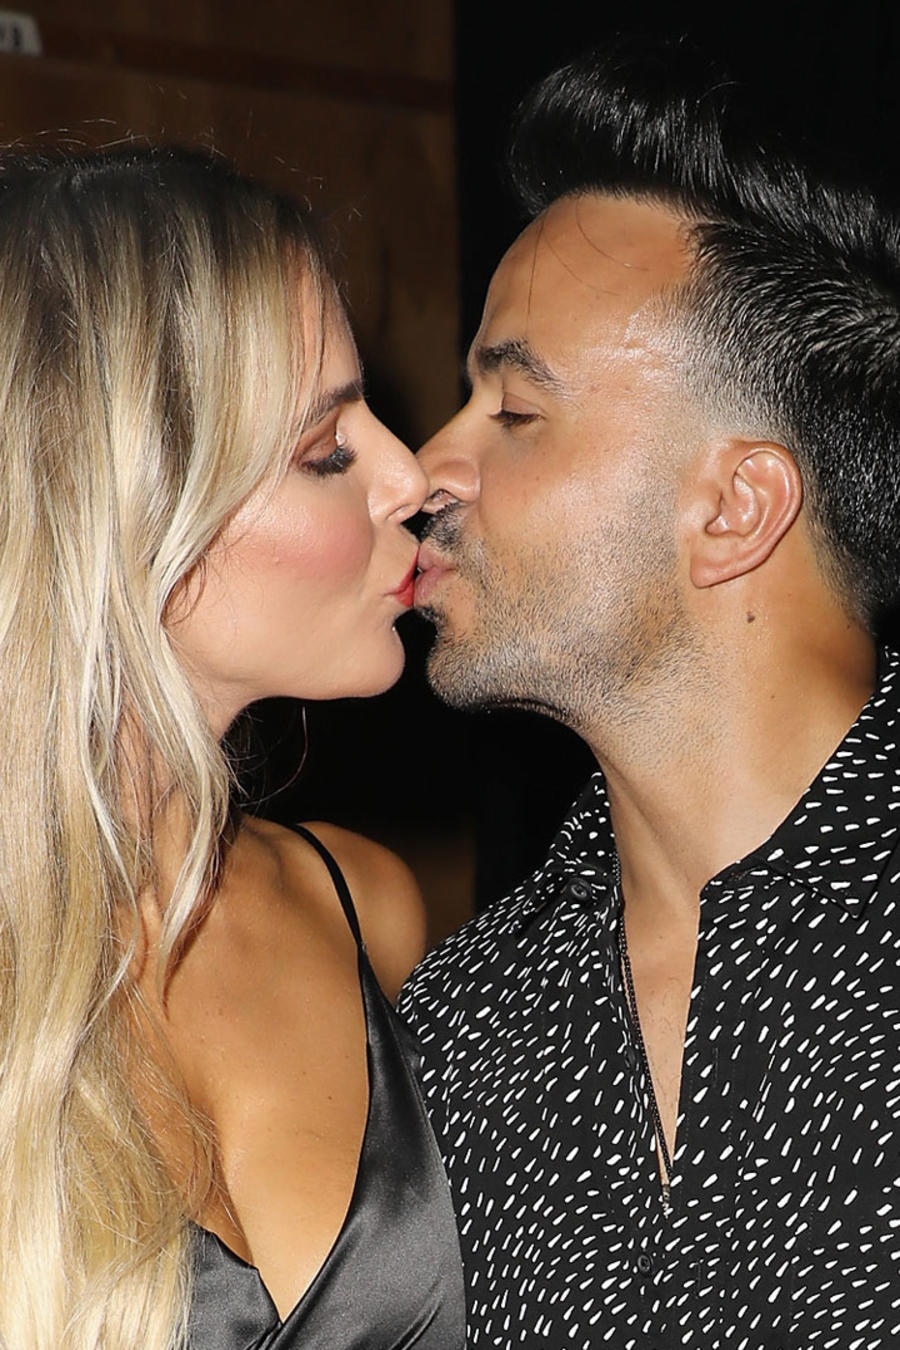 Águeda López y Luis Fonsi besándose